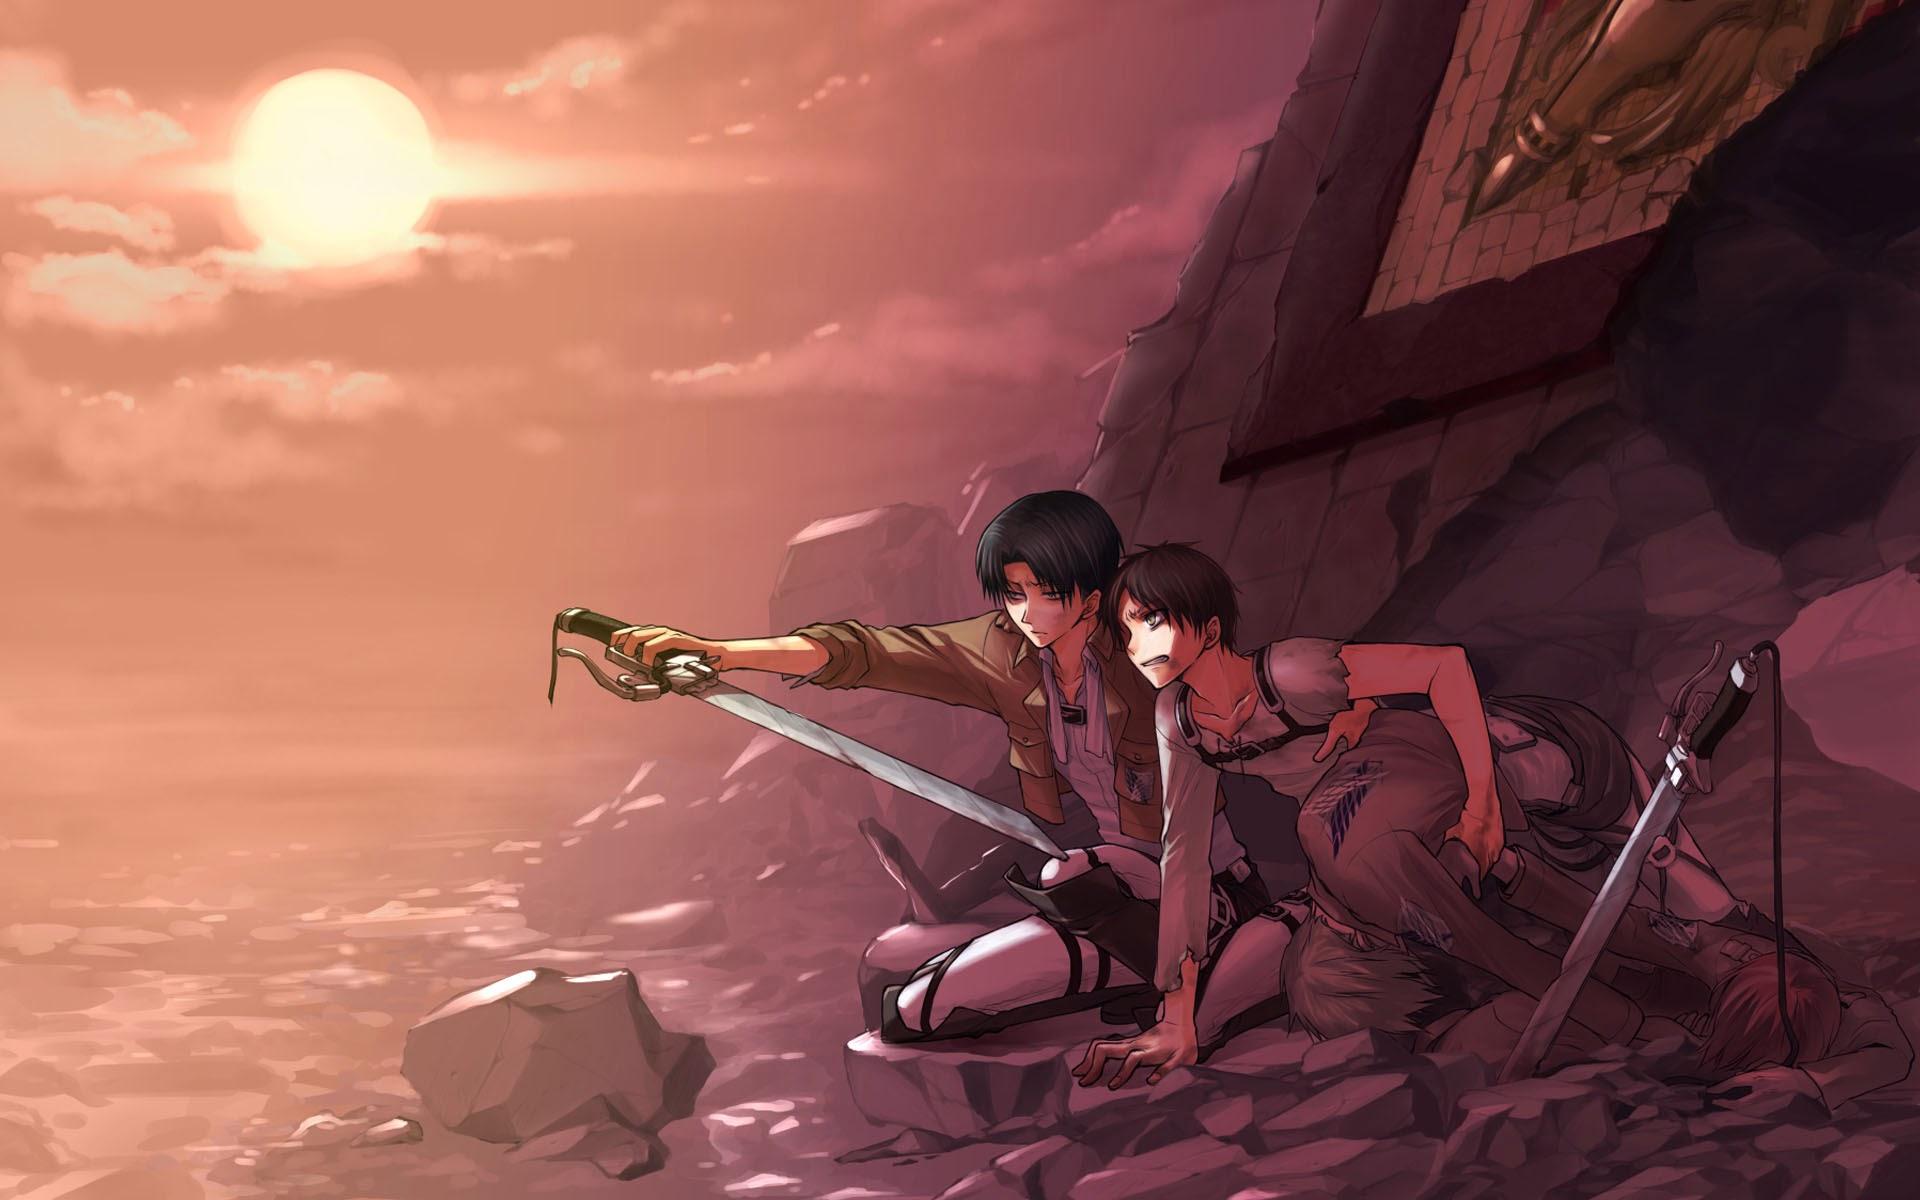 levi eren armin attack on titan shingeki no kyojin sunset hd wallpaper 1920x1200